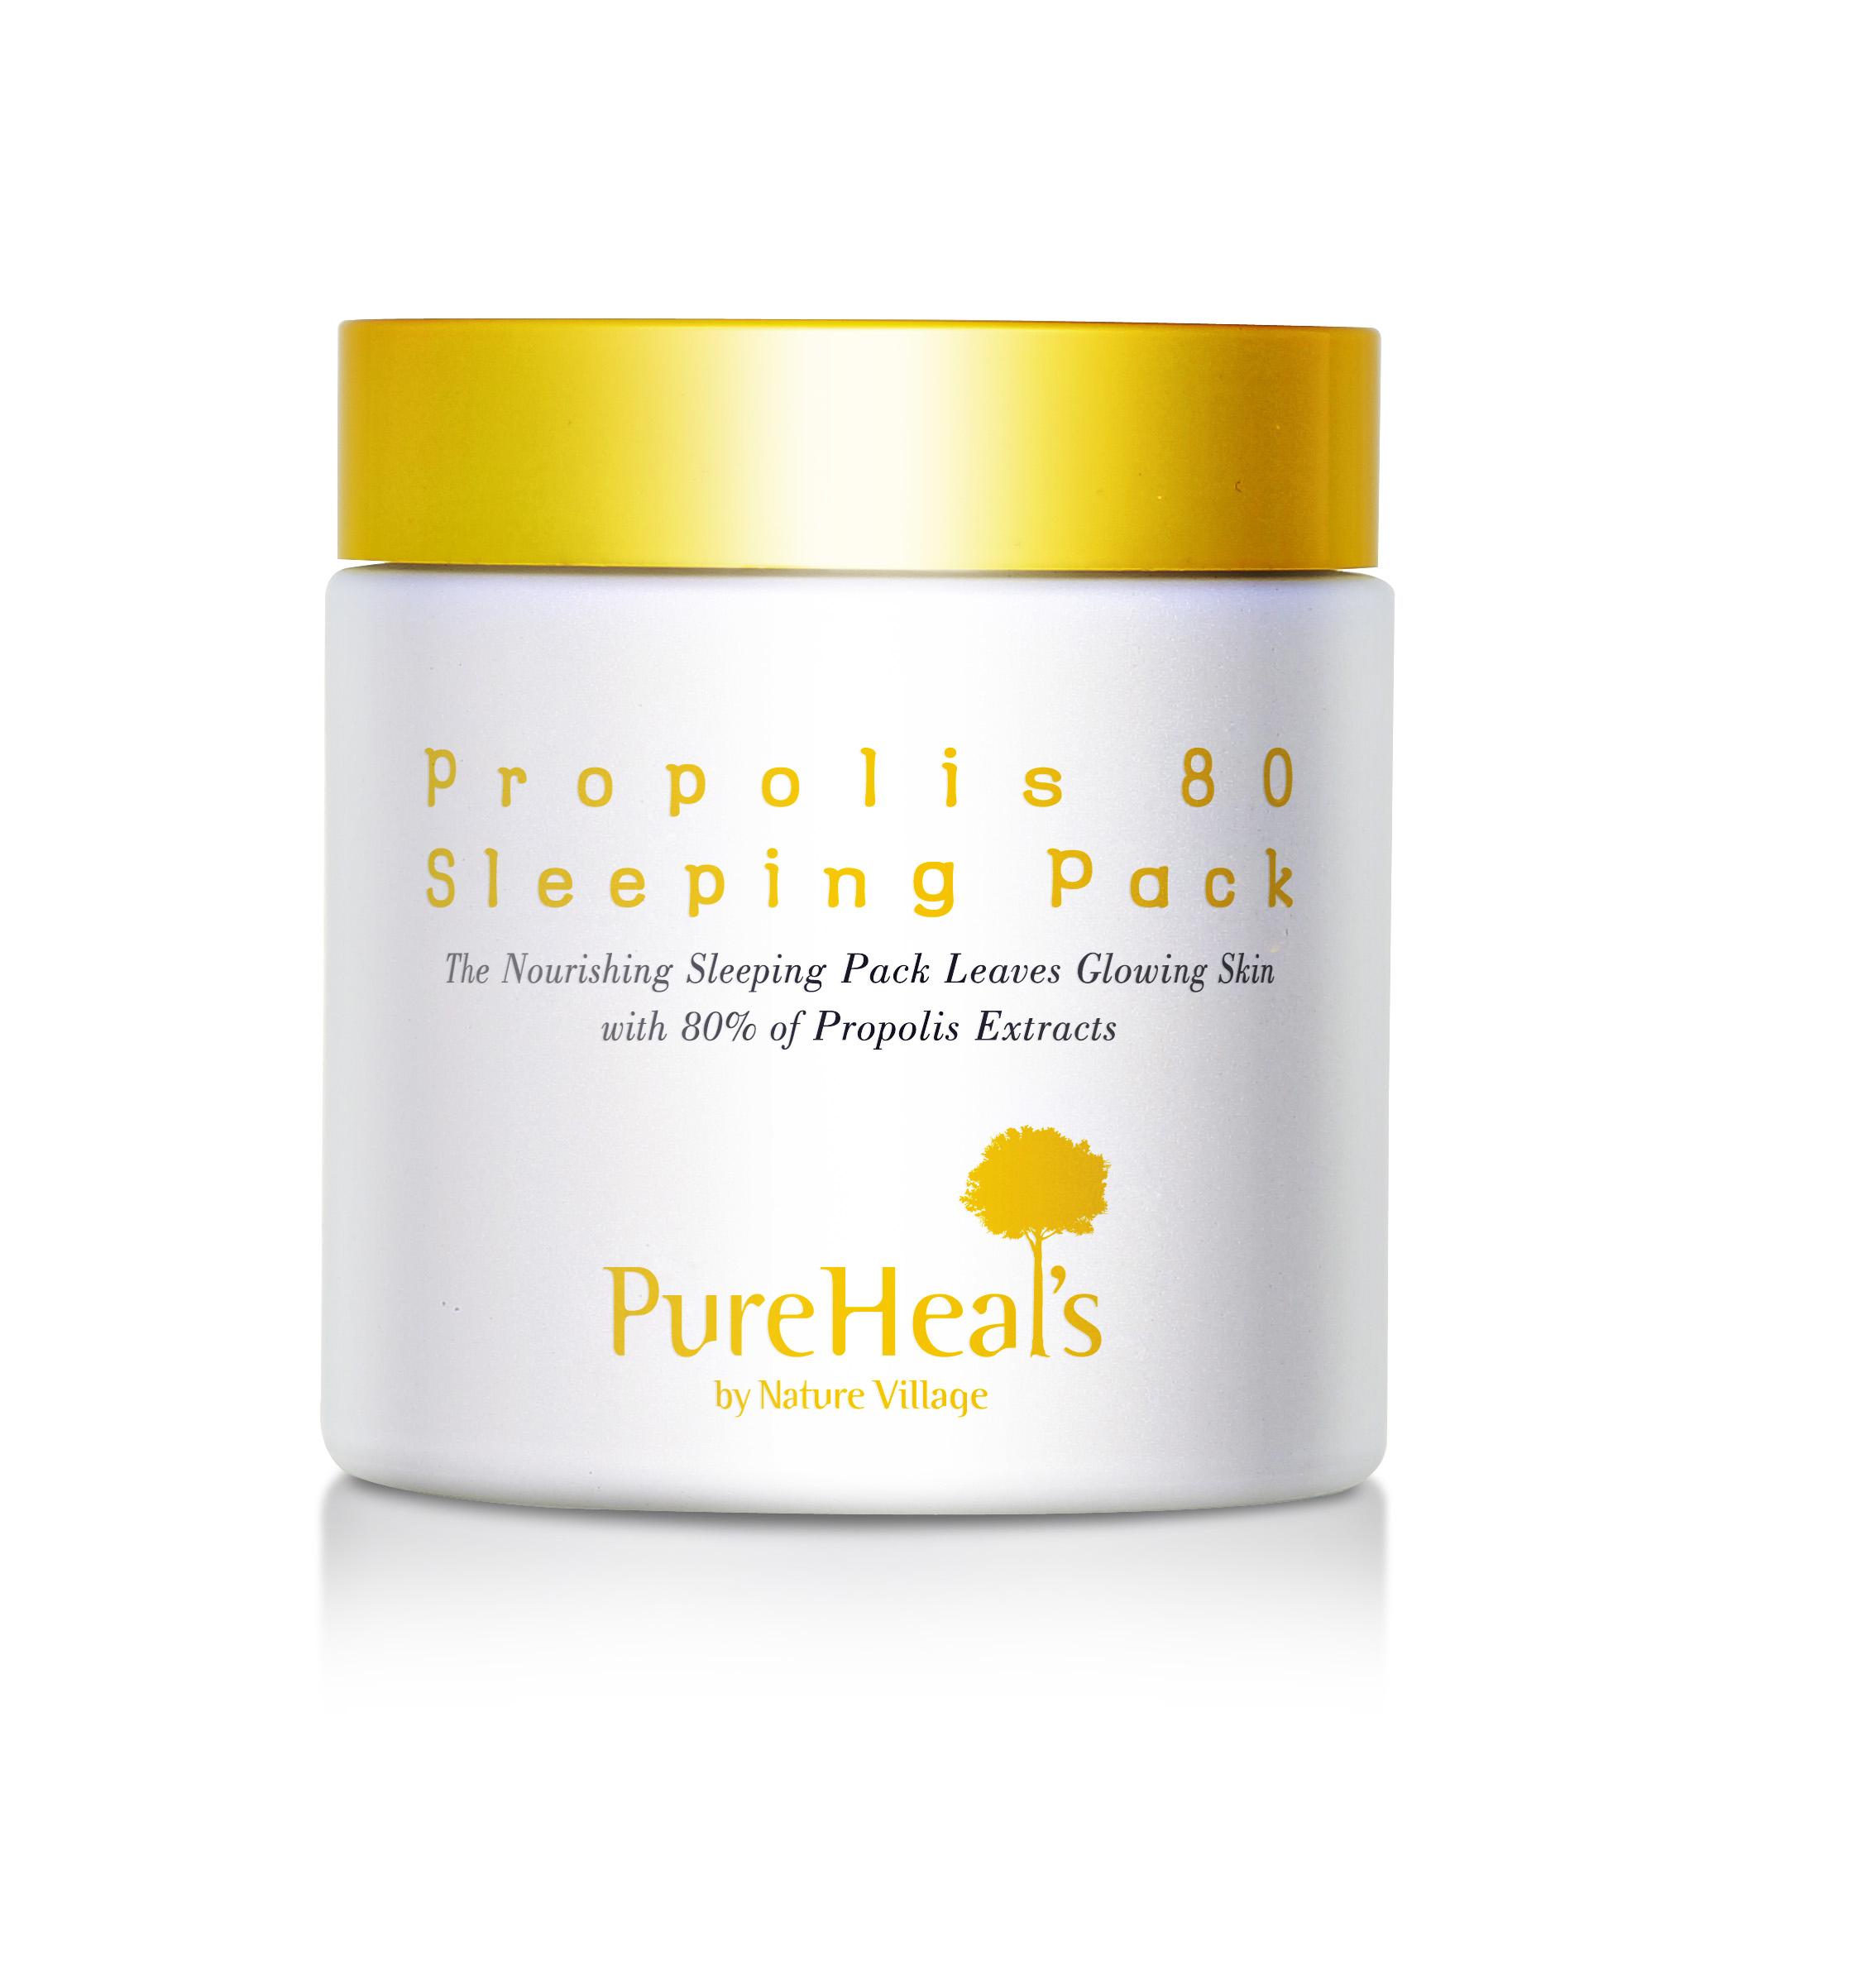 pureheals-propolis-80-sleeping-pack